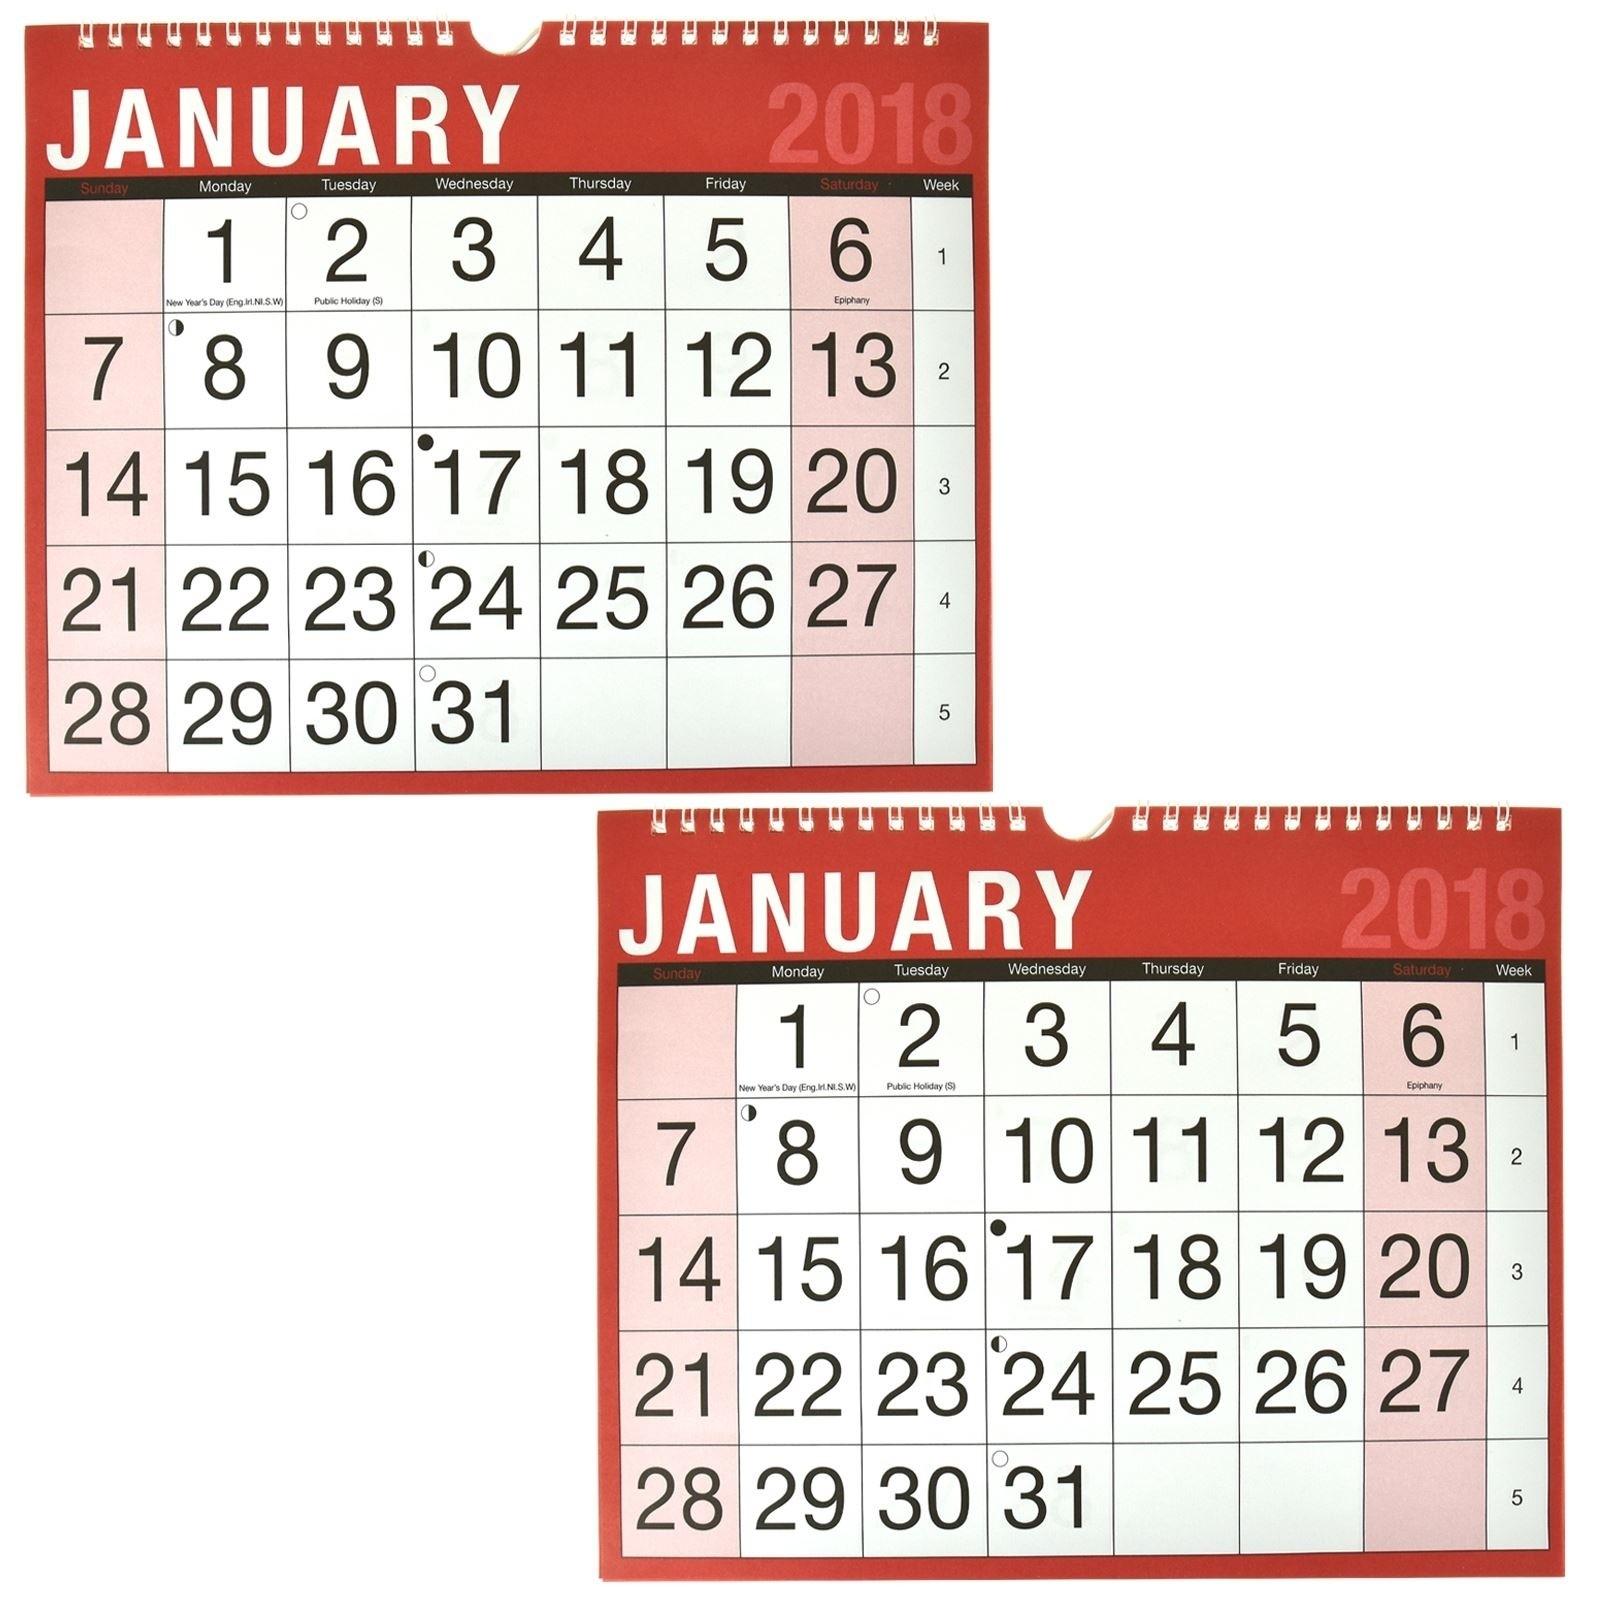 Monthly Calendar Spiral Bound • Printable Blank Calendar-Spiral Bound Monthly Calendar